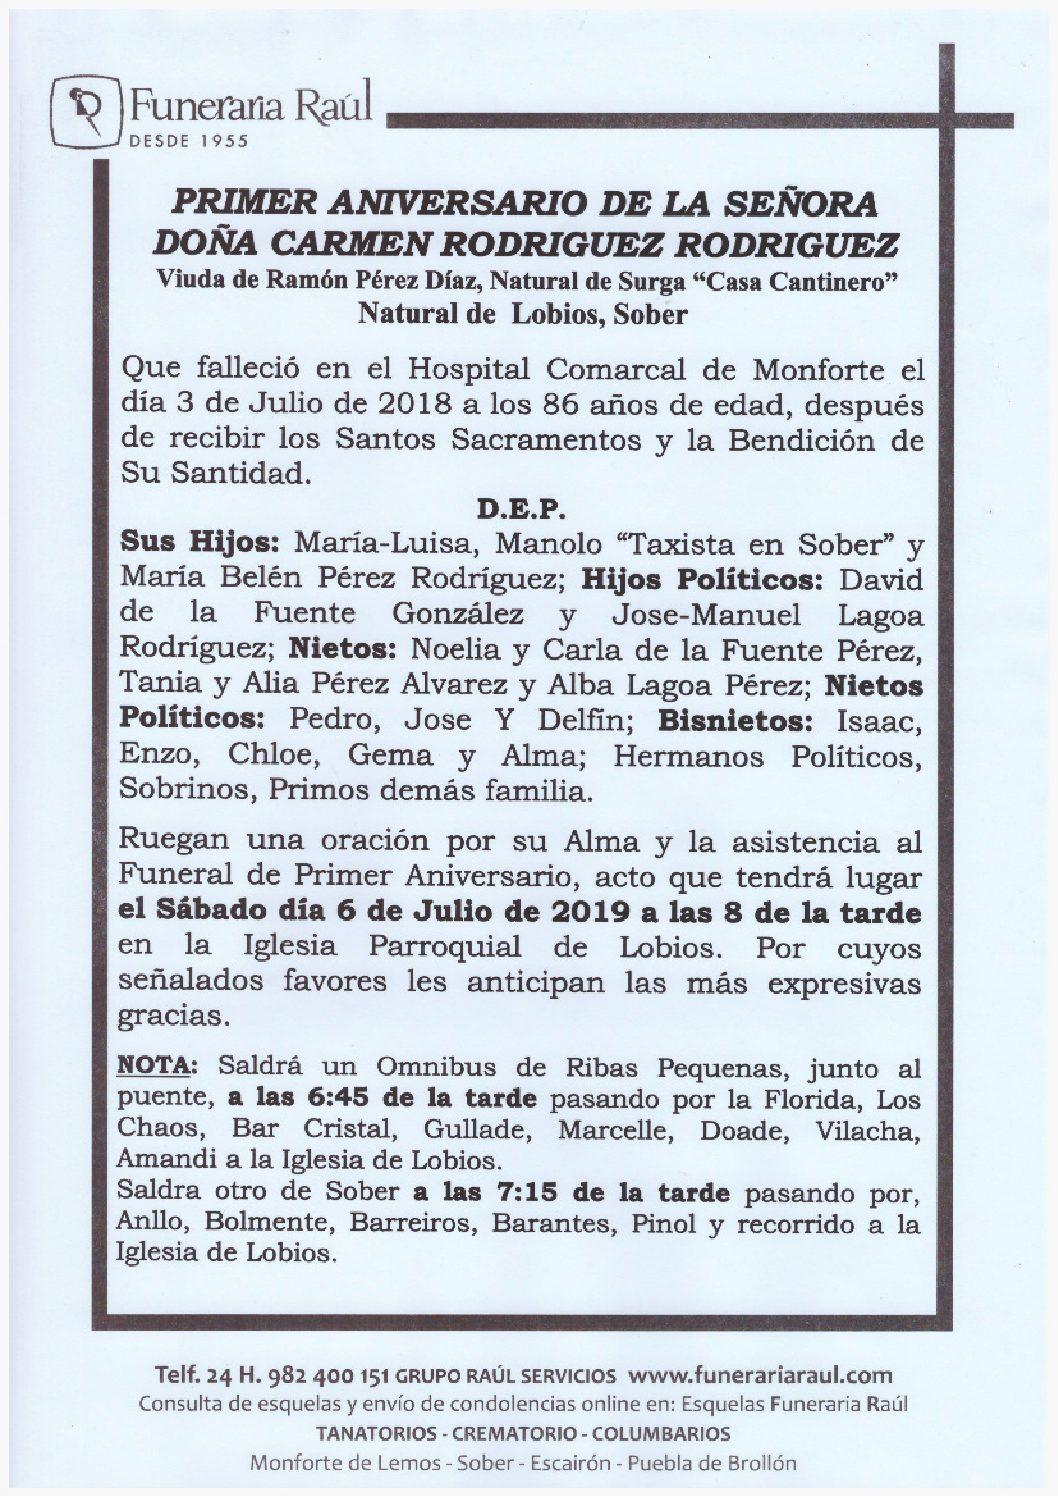 PRIMER ANIVERSARIO DE DOÑA CARMEN RODRIGUEZ RODRIGUEZ